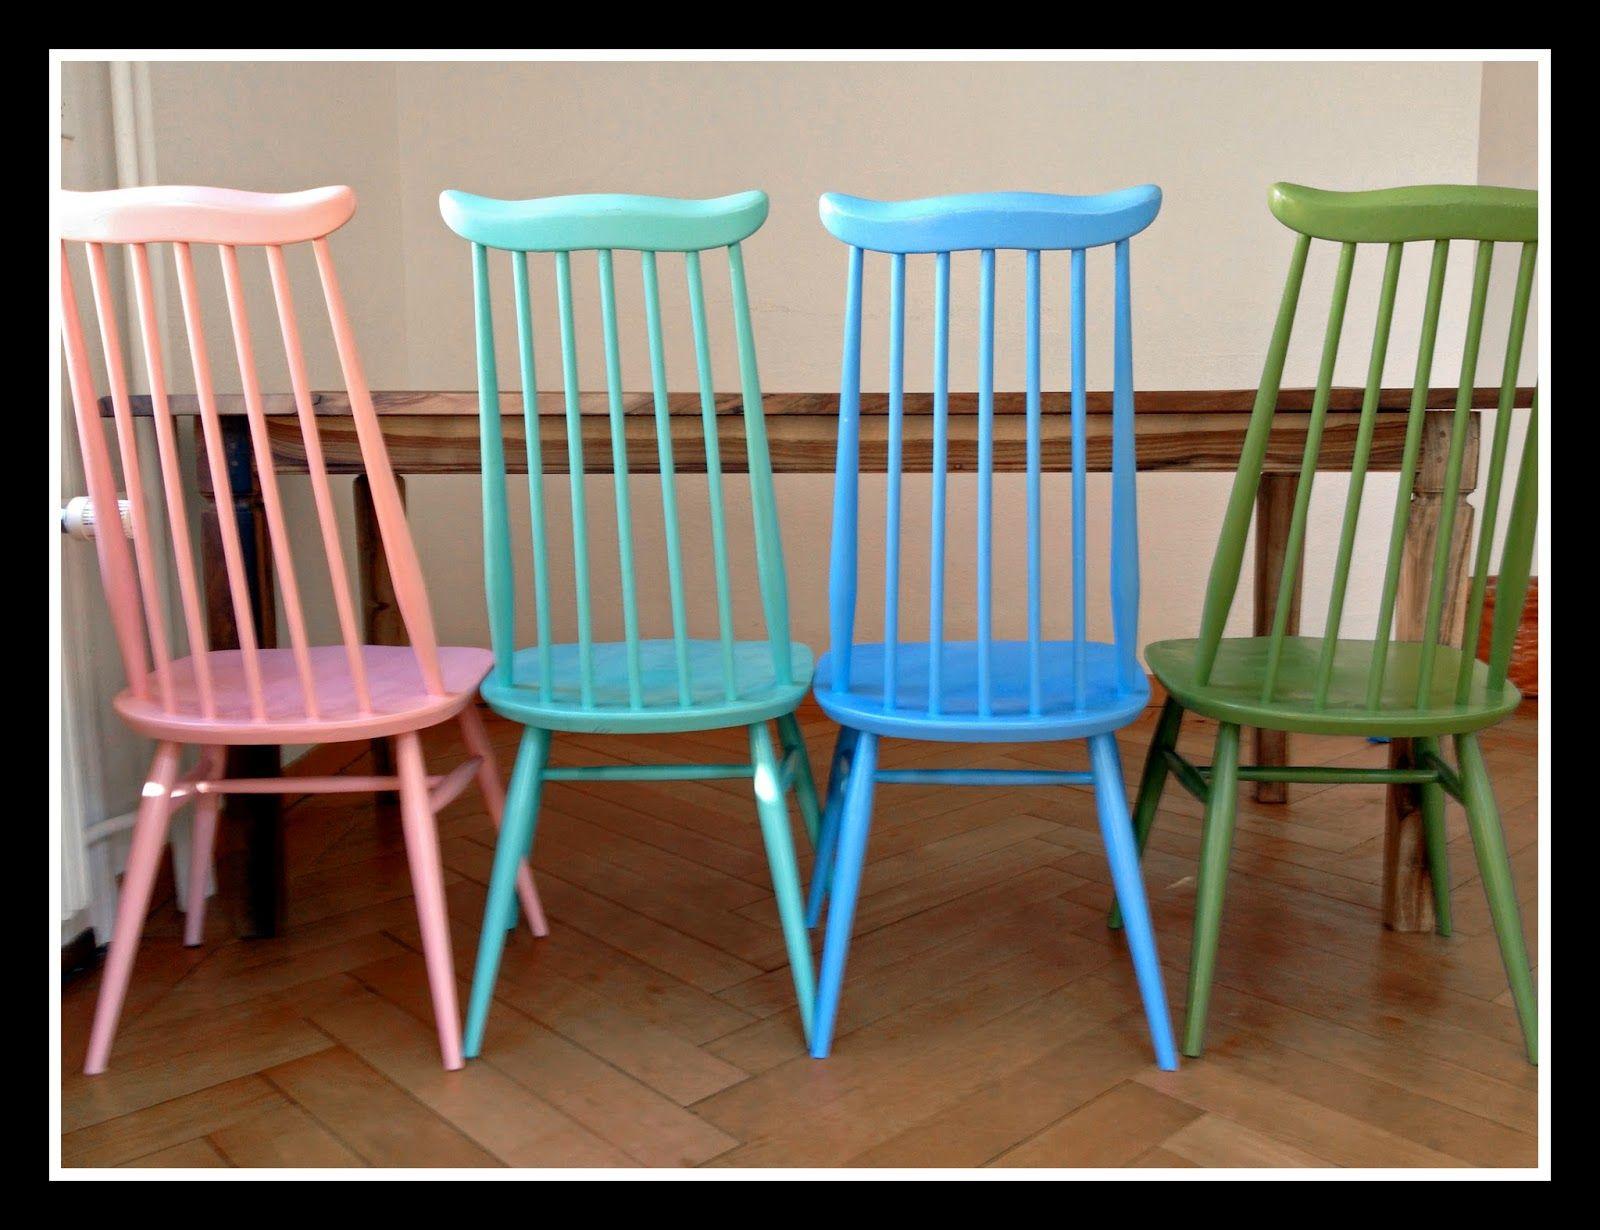 n8zwerg farbige st hle homemade deco furniture pinterest st hle farbig und deko. Black Bedroom Furniture Sets. Home Design Ideas